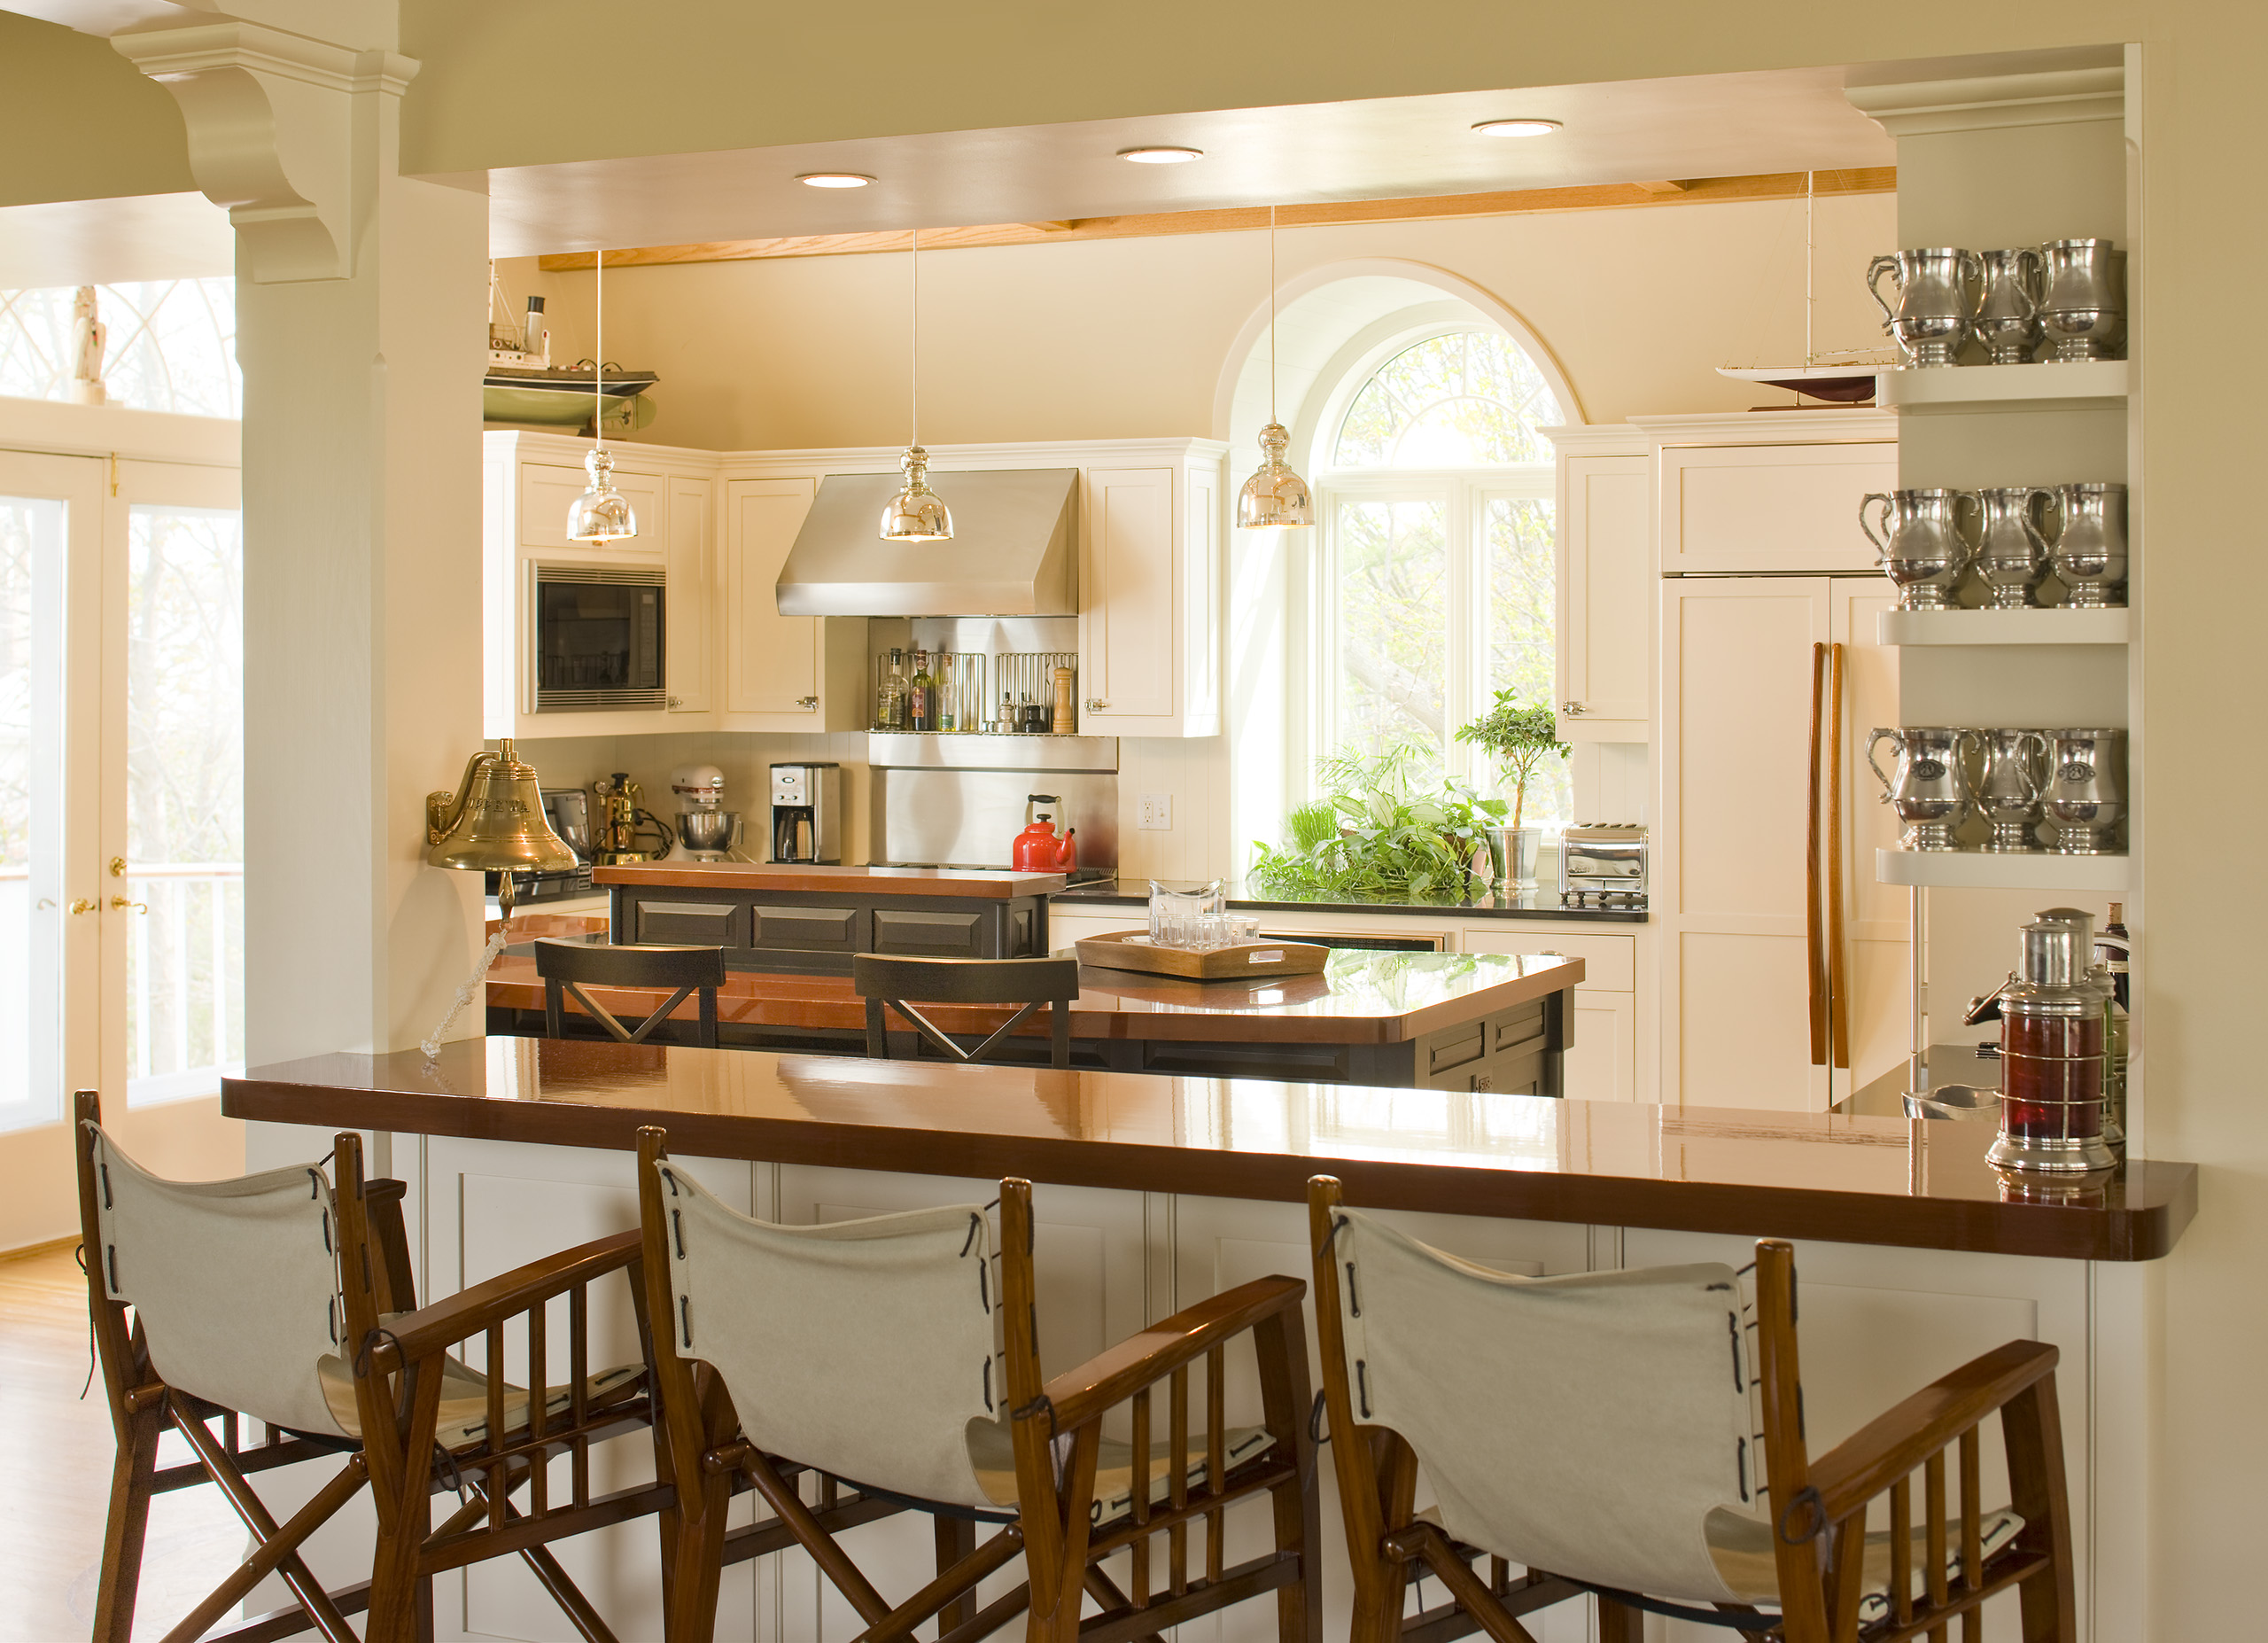 kim kirby kitchen design